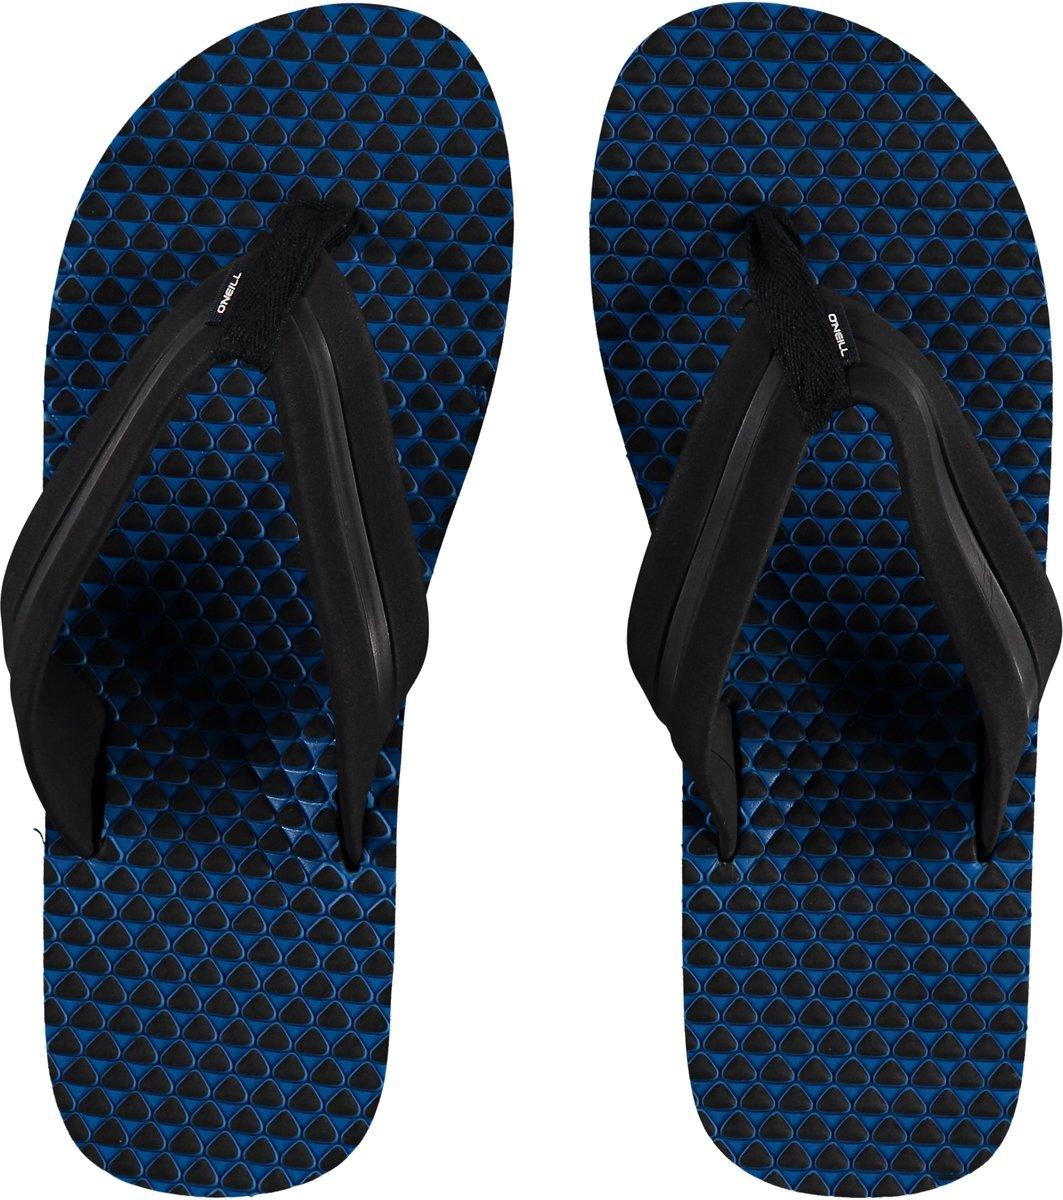 O'Neill Slippers Koosh Profile - Diepwater Blauw - 42 kopen